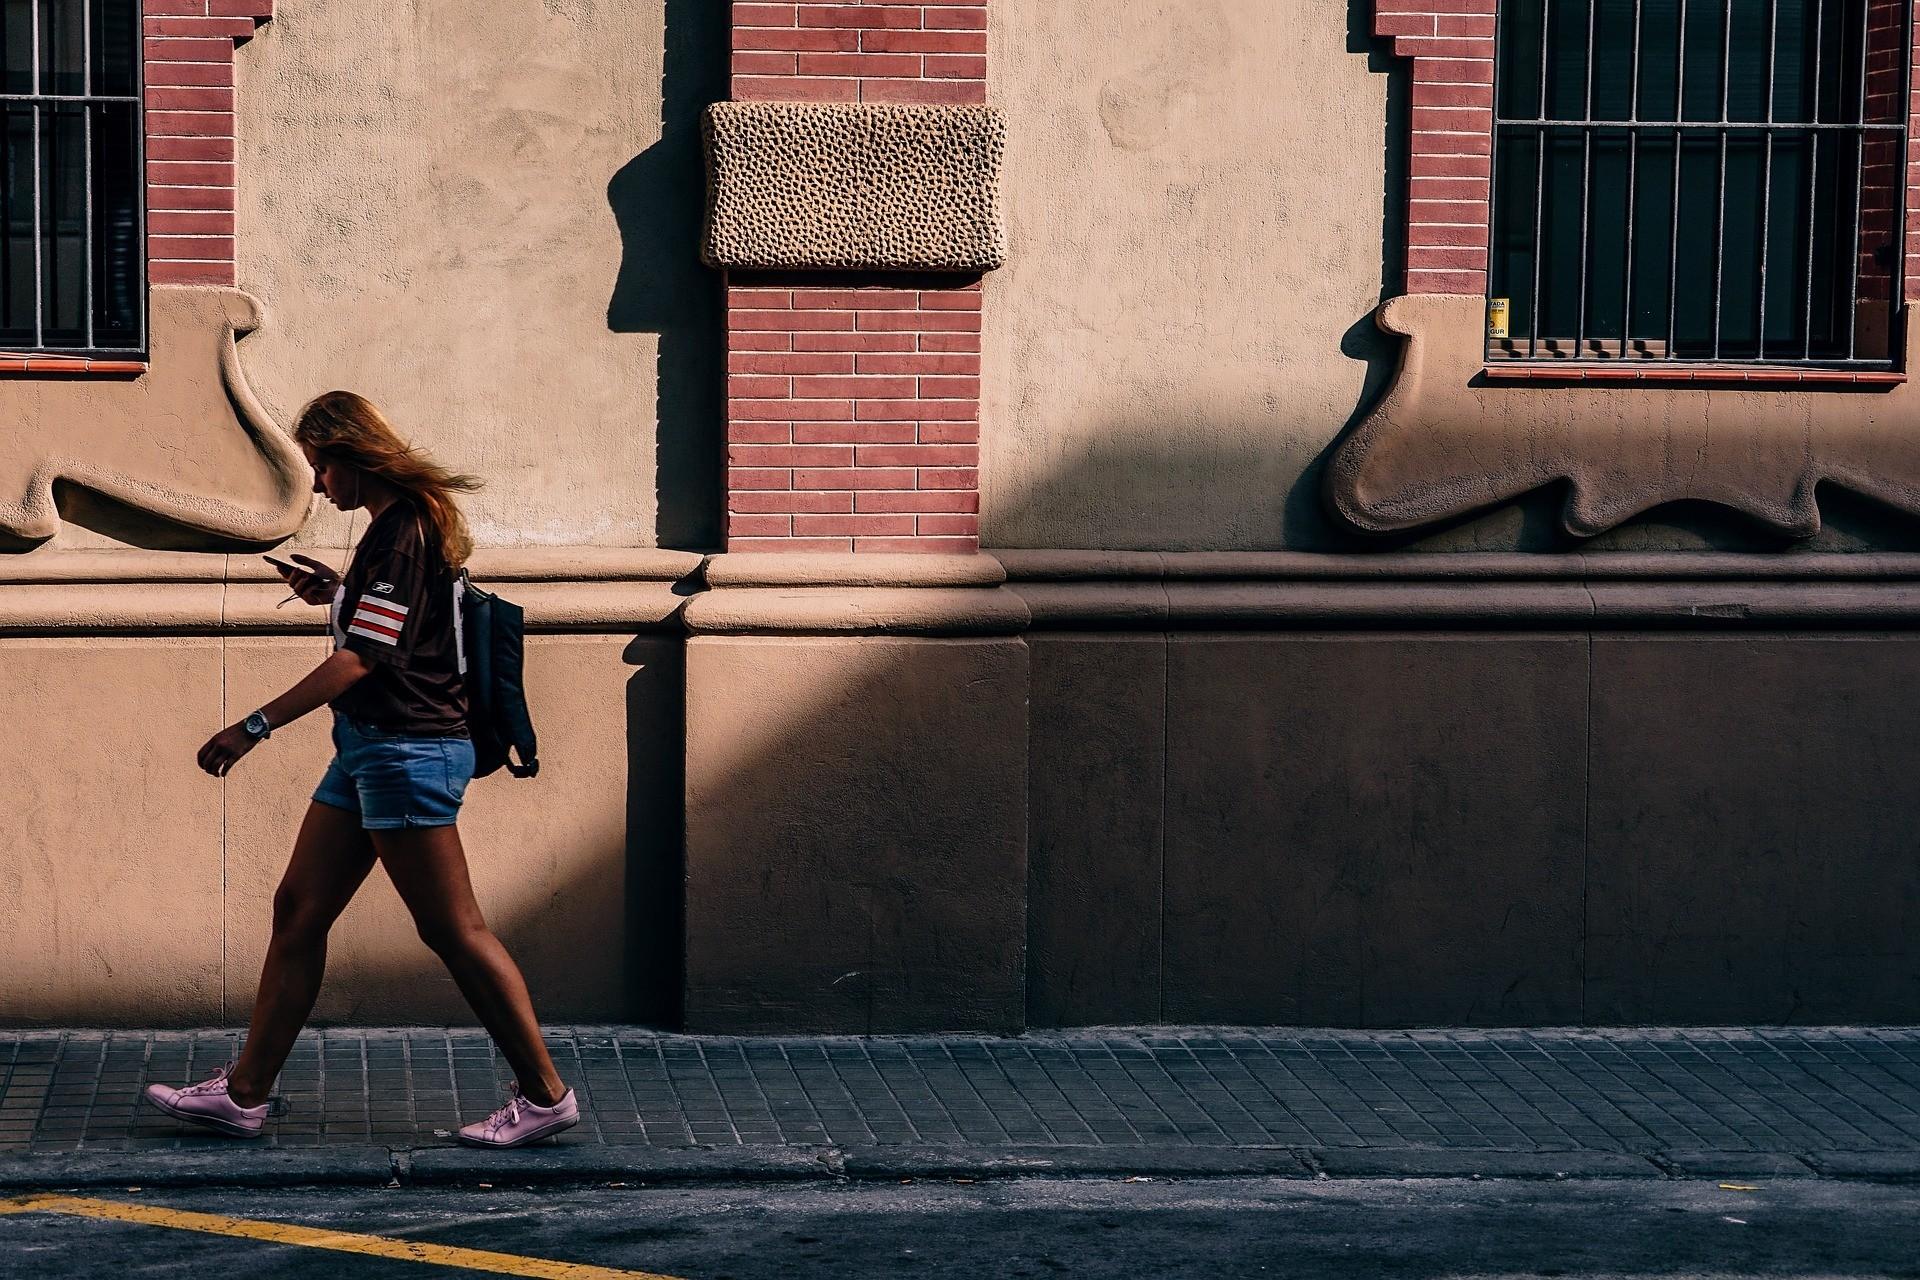 Women walking while looking at phone